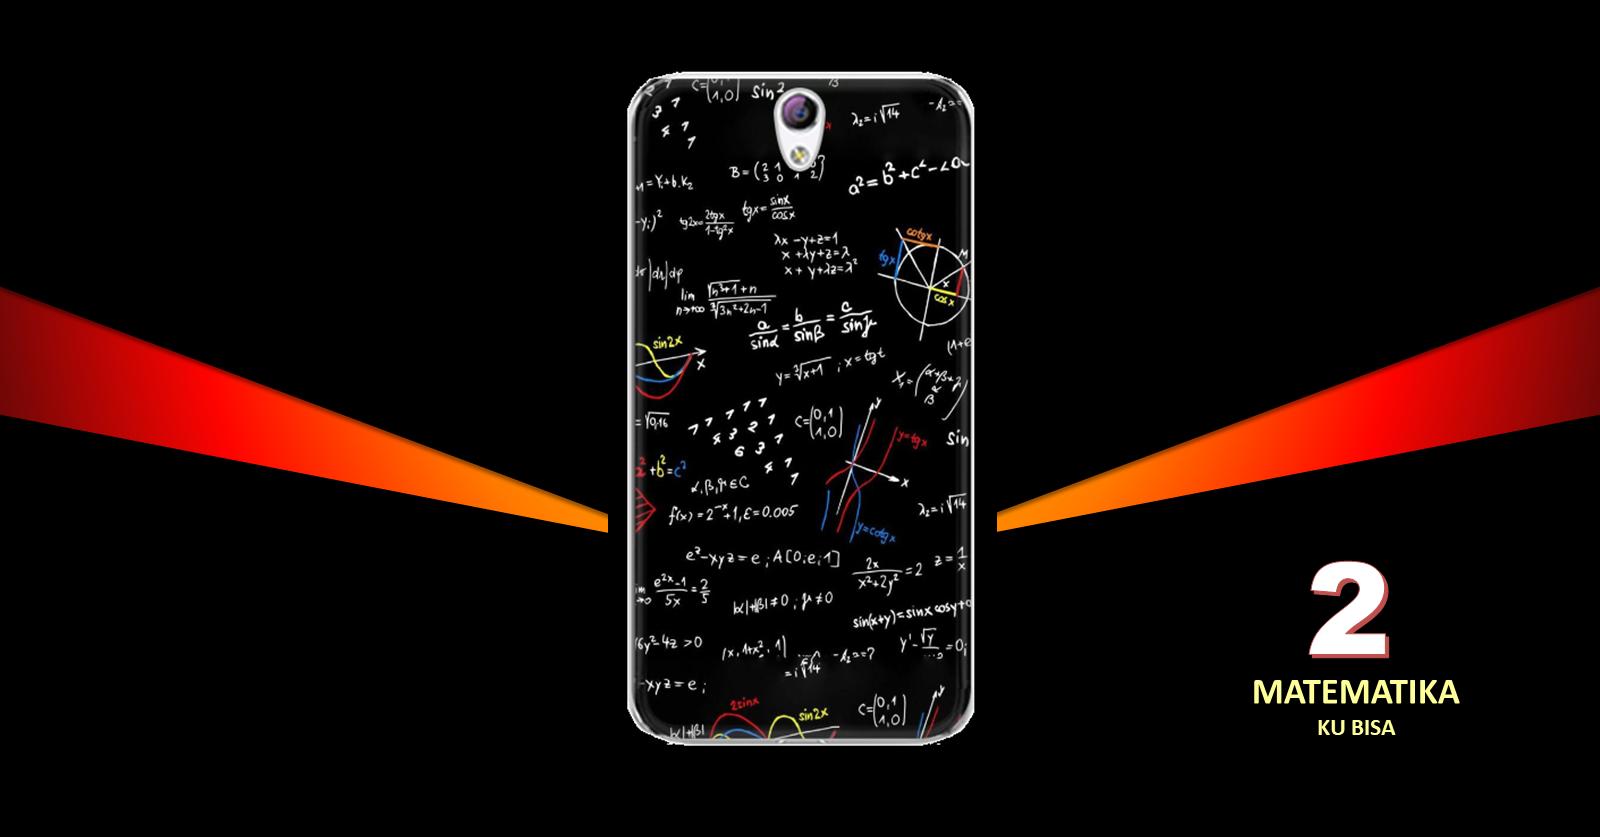 Case Matematika 2